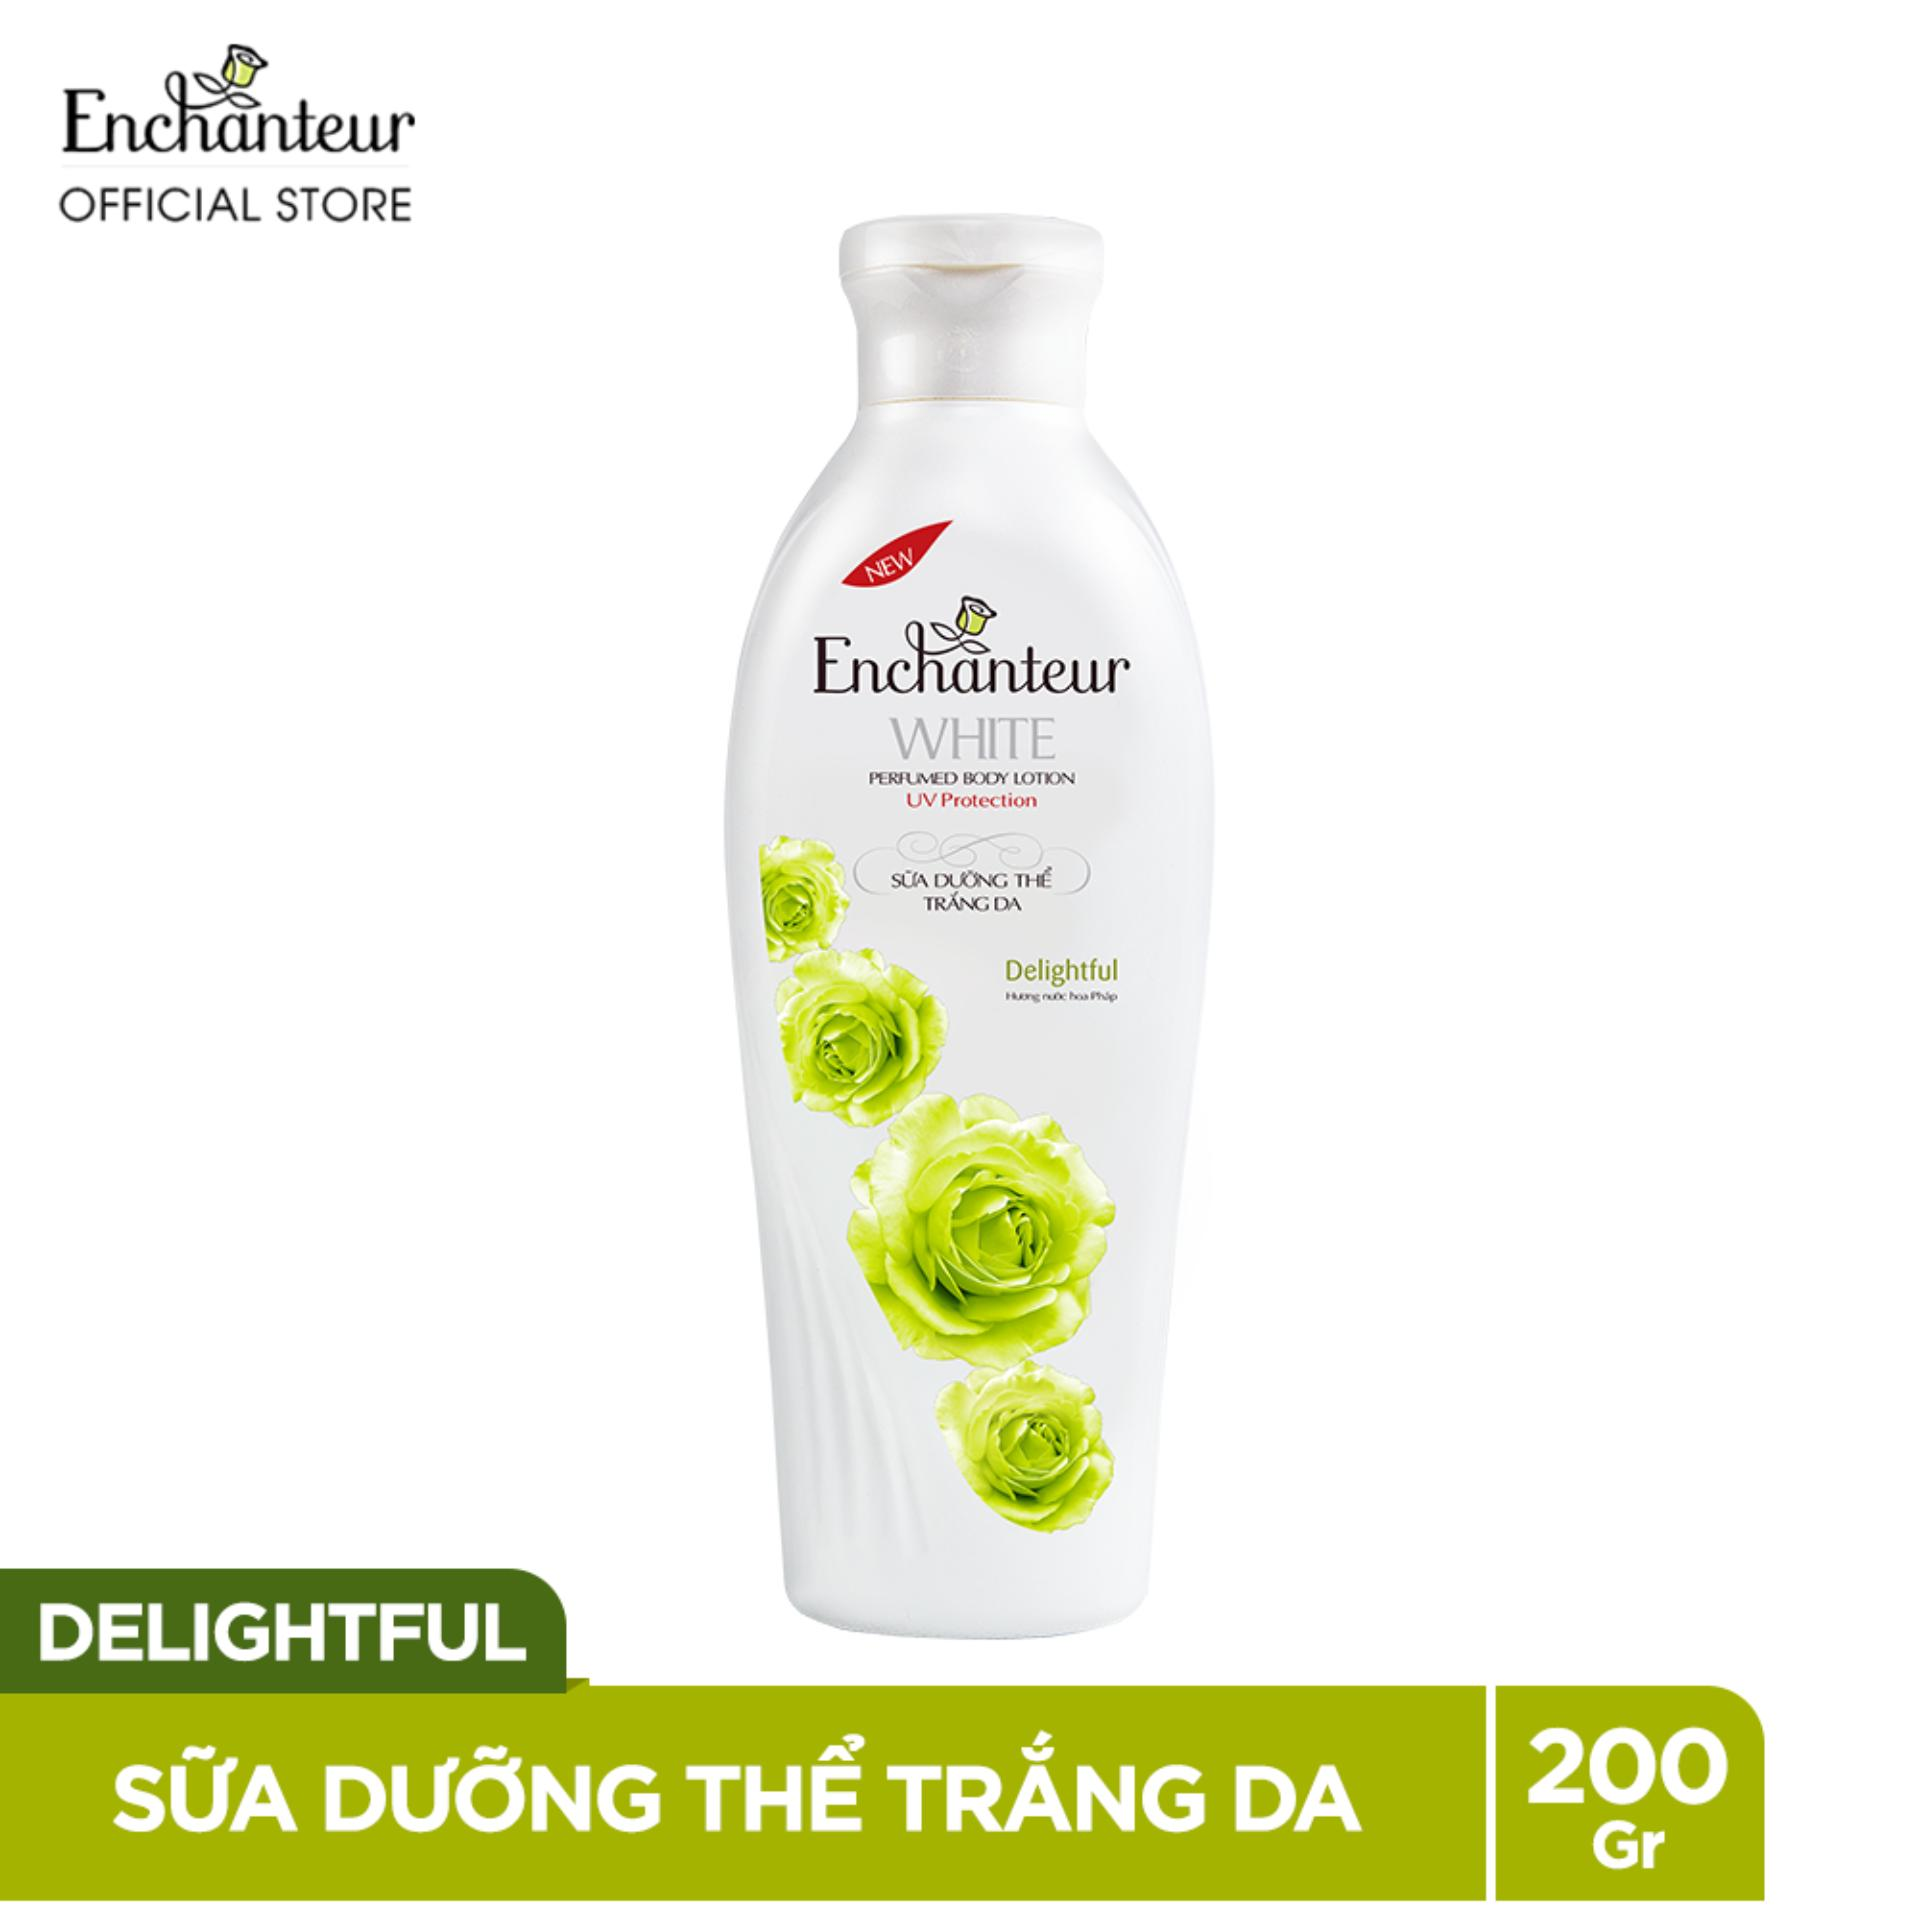 Enchanteur sữa dưỡng thể trắng da Delightful 200g